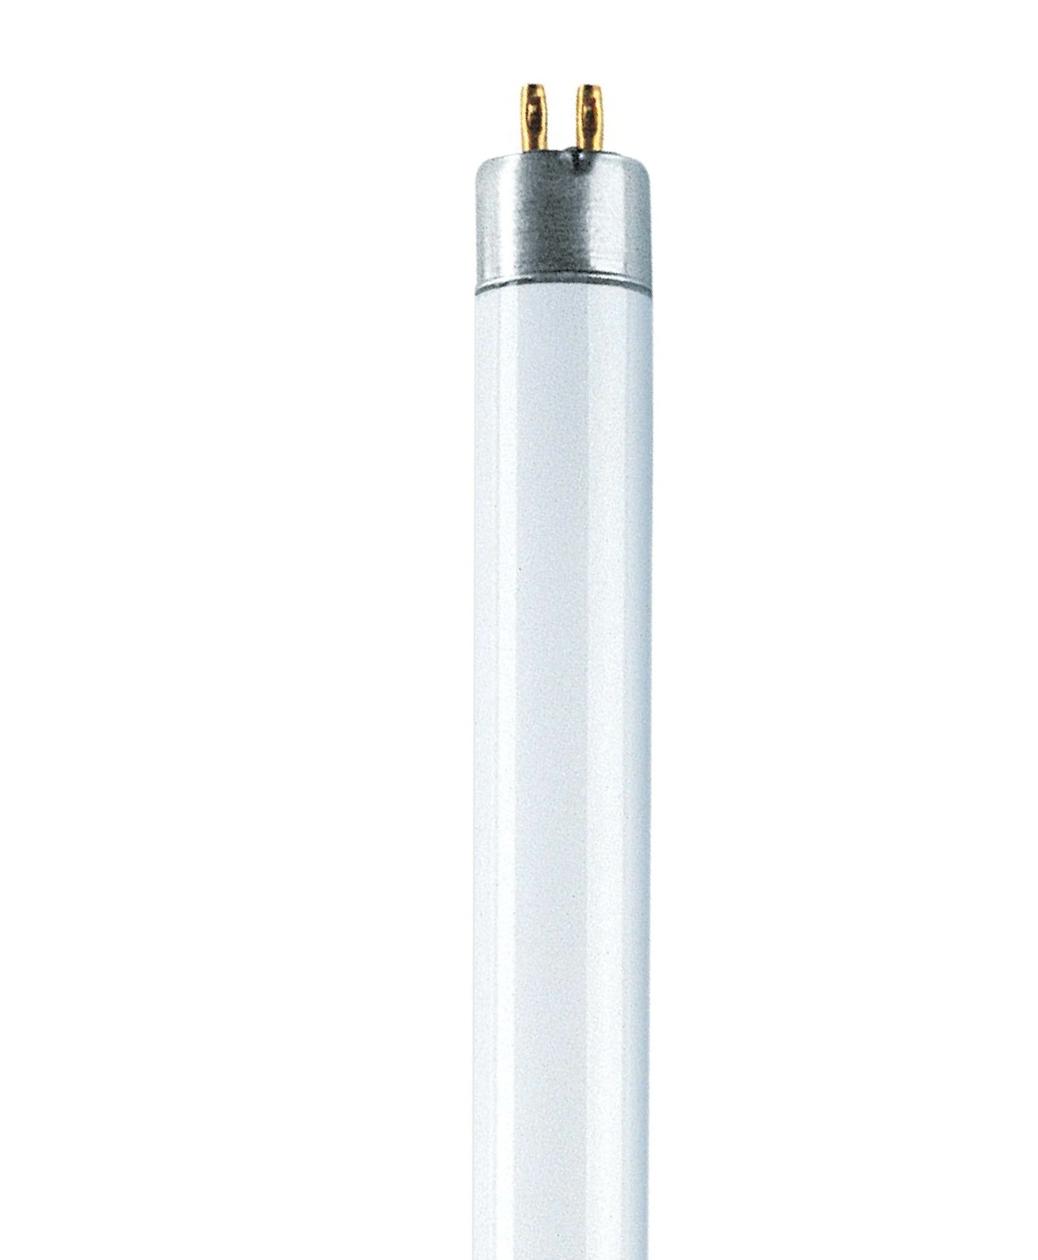 1 Stk T5 8W/840 G5 430lm Leuchtstofflampe 16mm LI5V008929